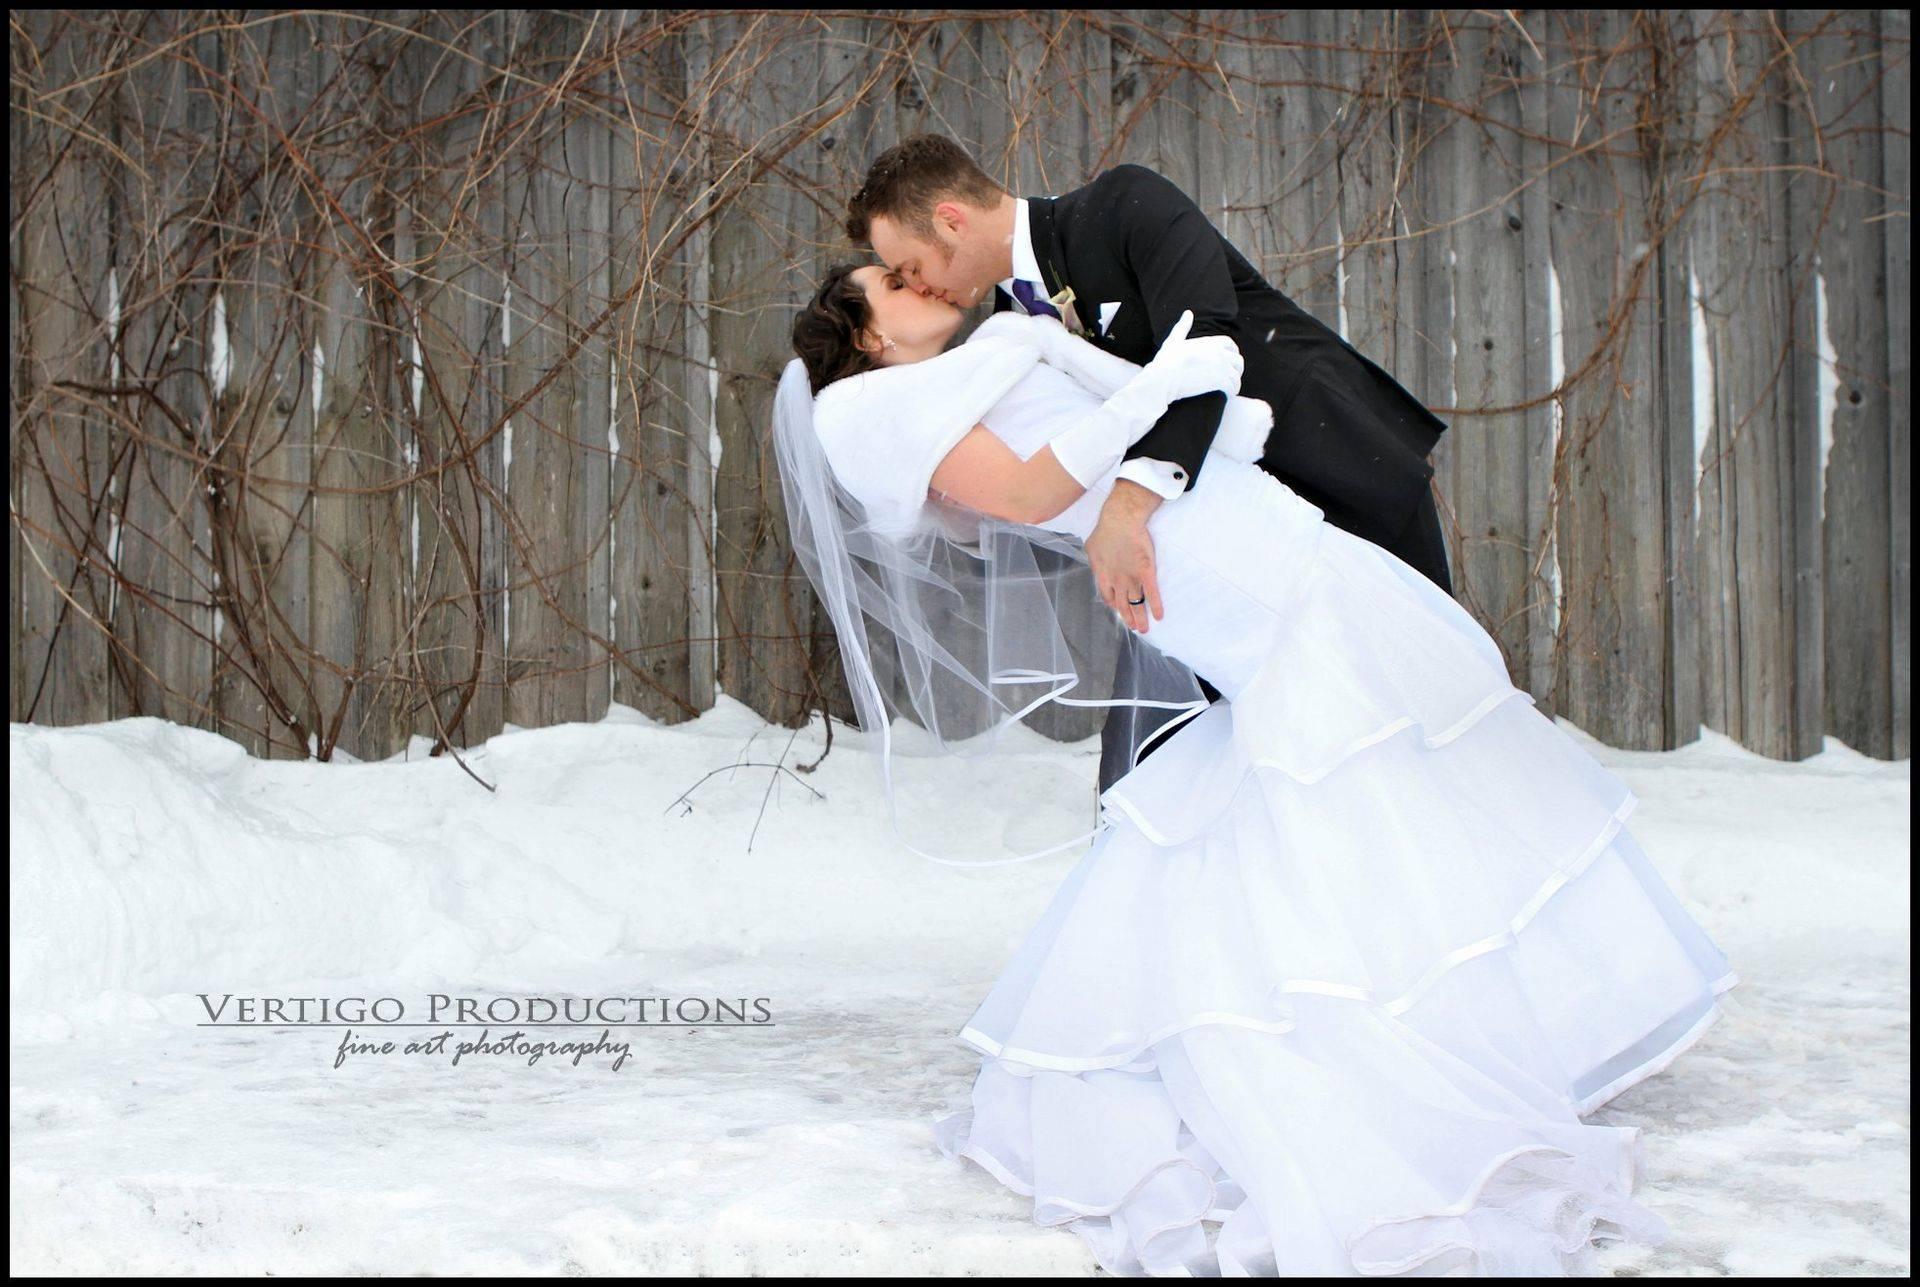 ottawa wedding photographer, strathmere inn, vertigo productions photography